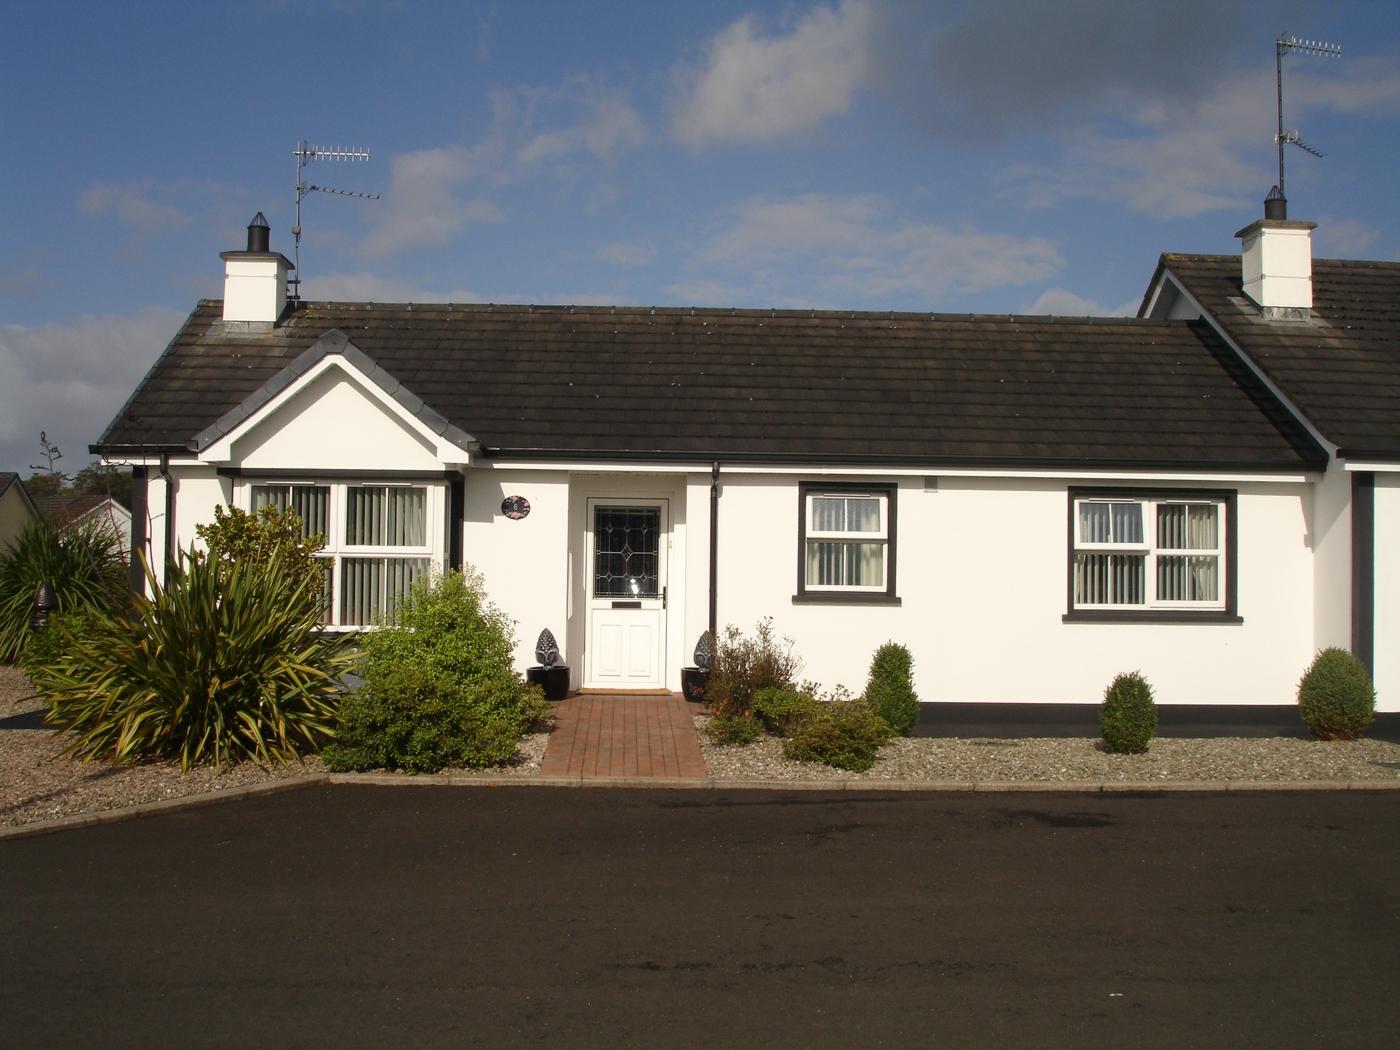 Hollywell Village  Killea  Co. Donegal  Ireland